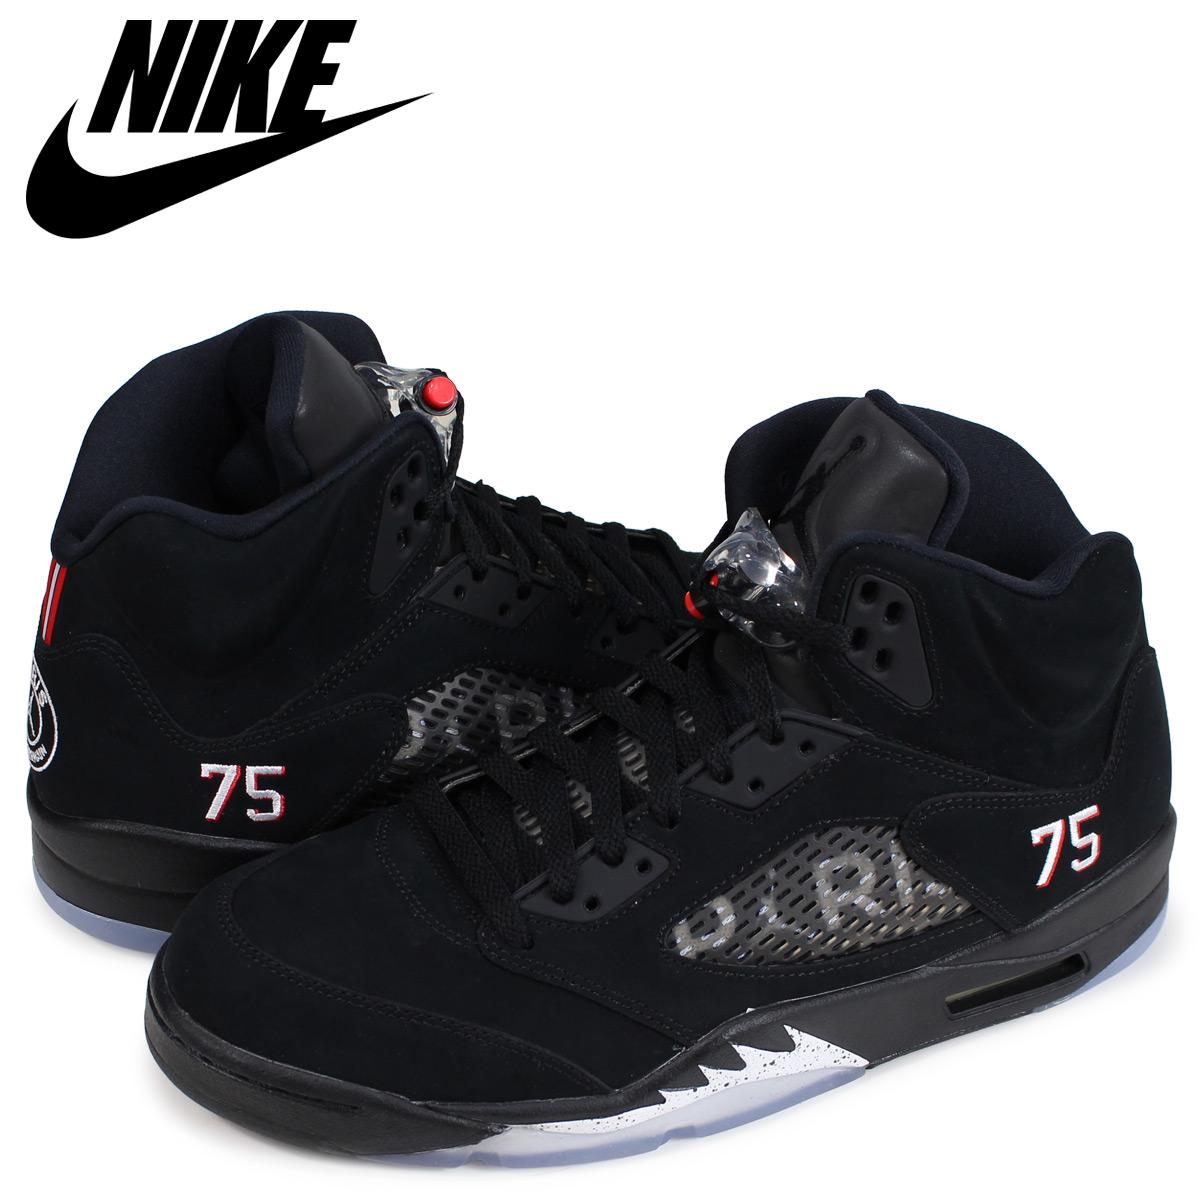 e5755f2f3b1d NIKE Nike Air Jordan 5 nostalgic sneakers men AIR JORDAN 5 RETRO BCFC PSG  black AV9175-001